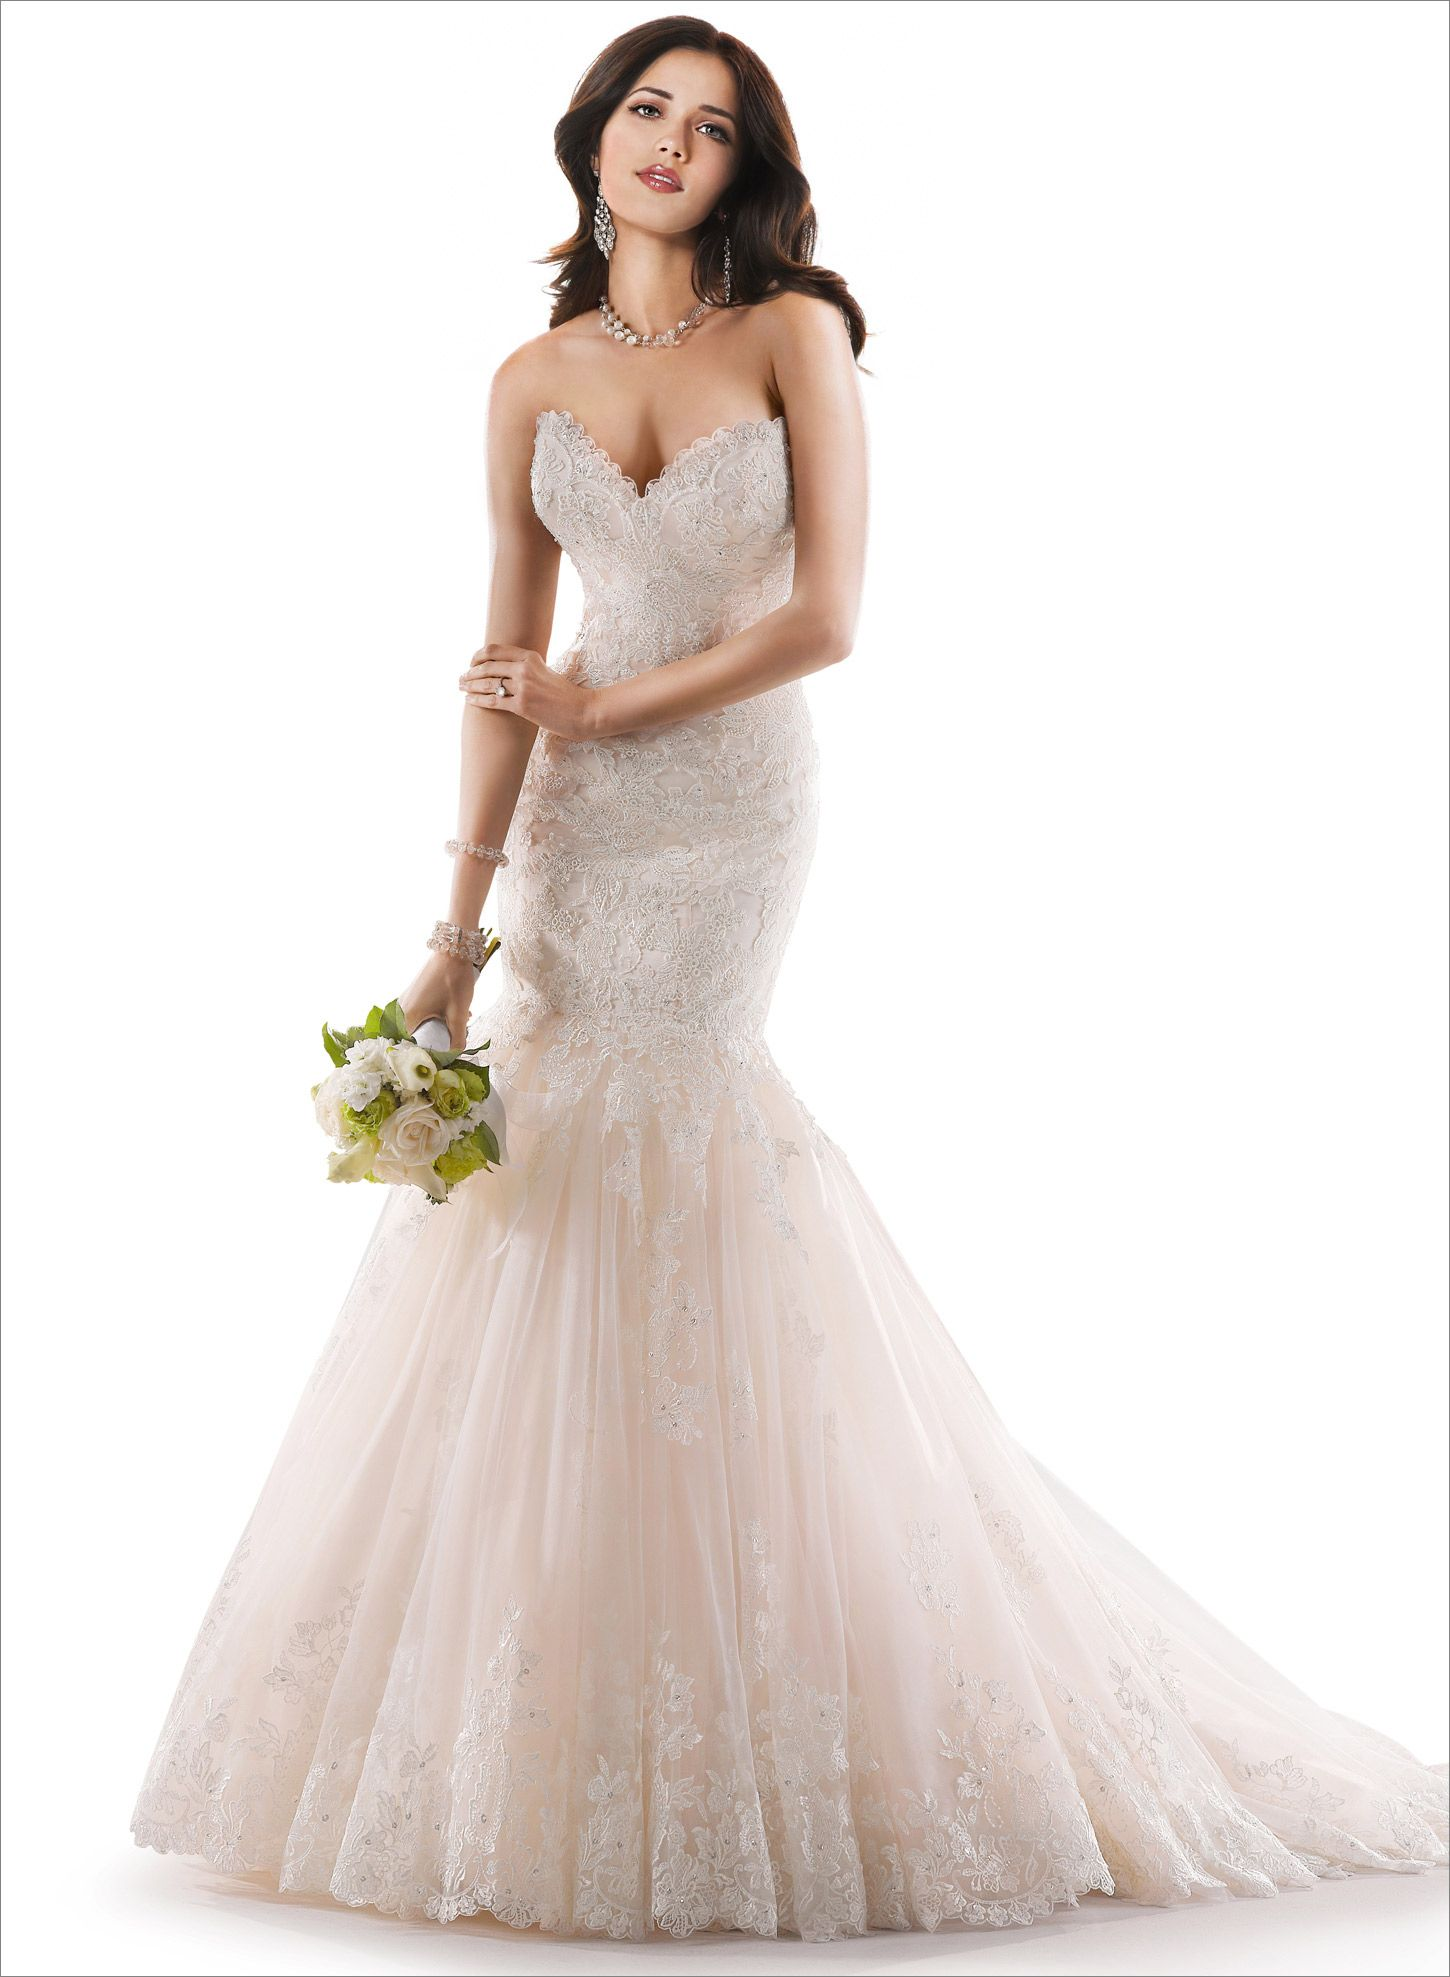 Maggie Sottero Wedding Dresses | Maggie sottero marianne, Maggie ...